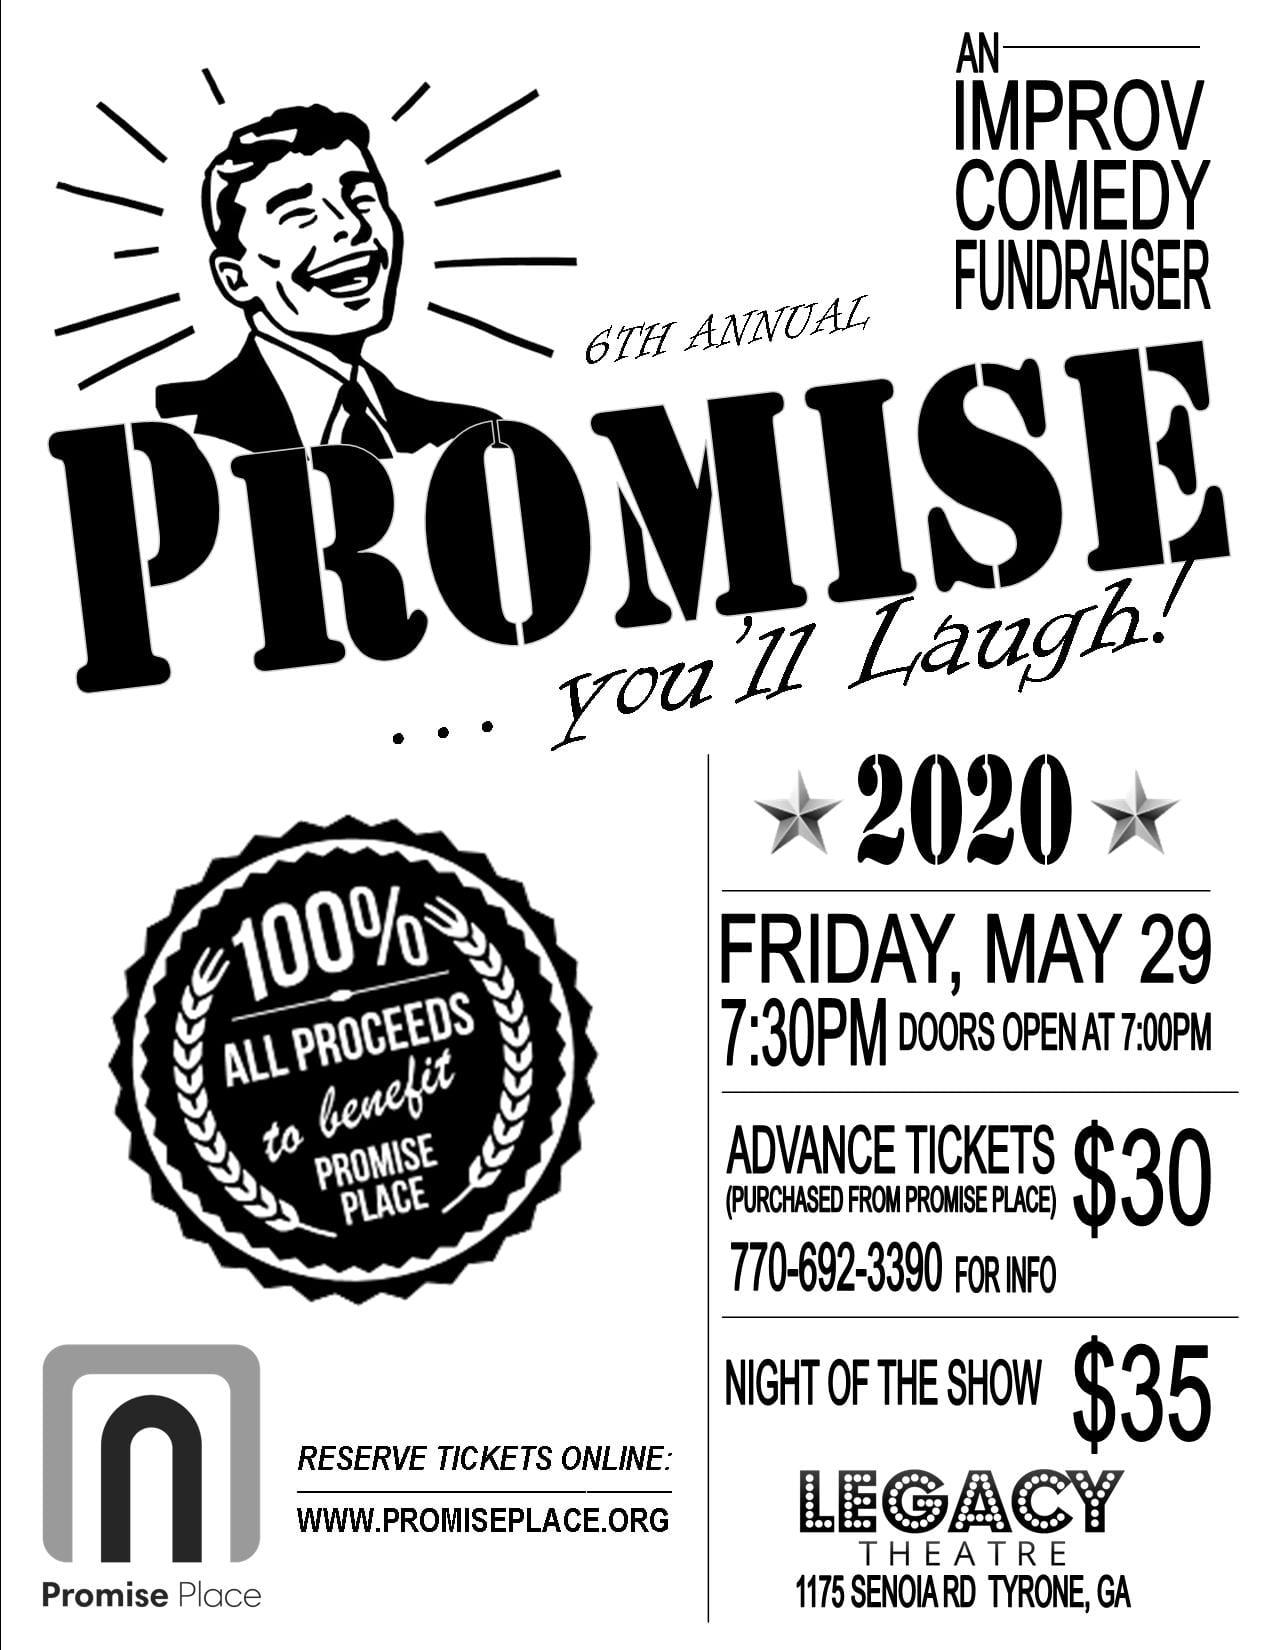 IMPROV Comedy Fundraiser FLYER - 2020